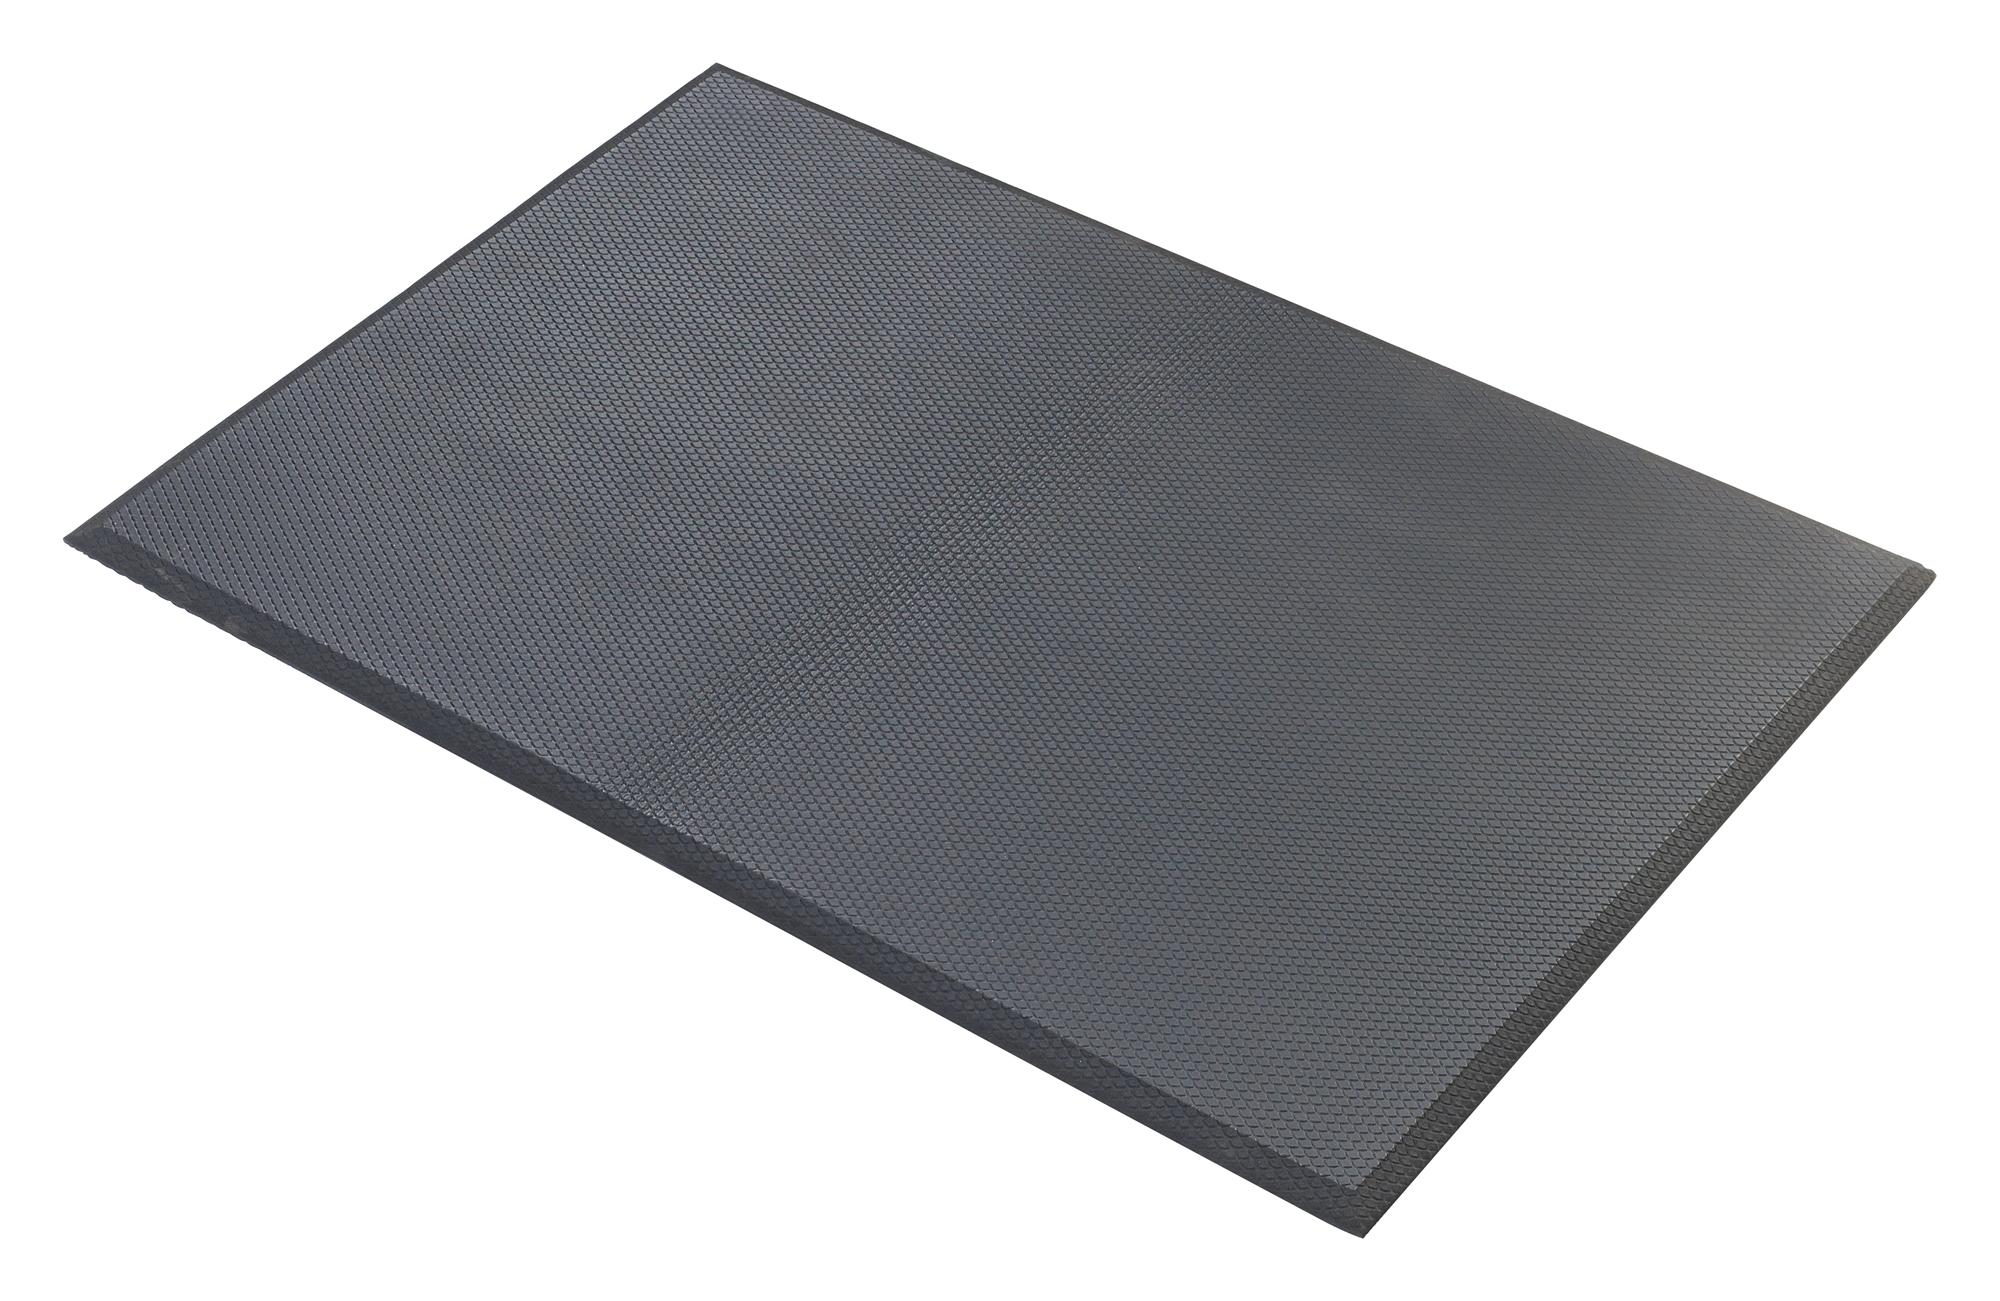 Winco FMG-23K floor mats